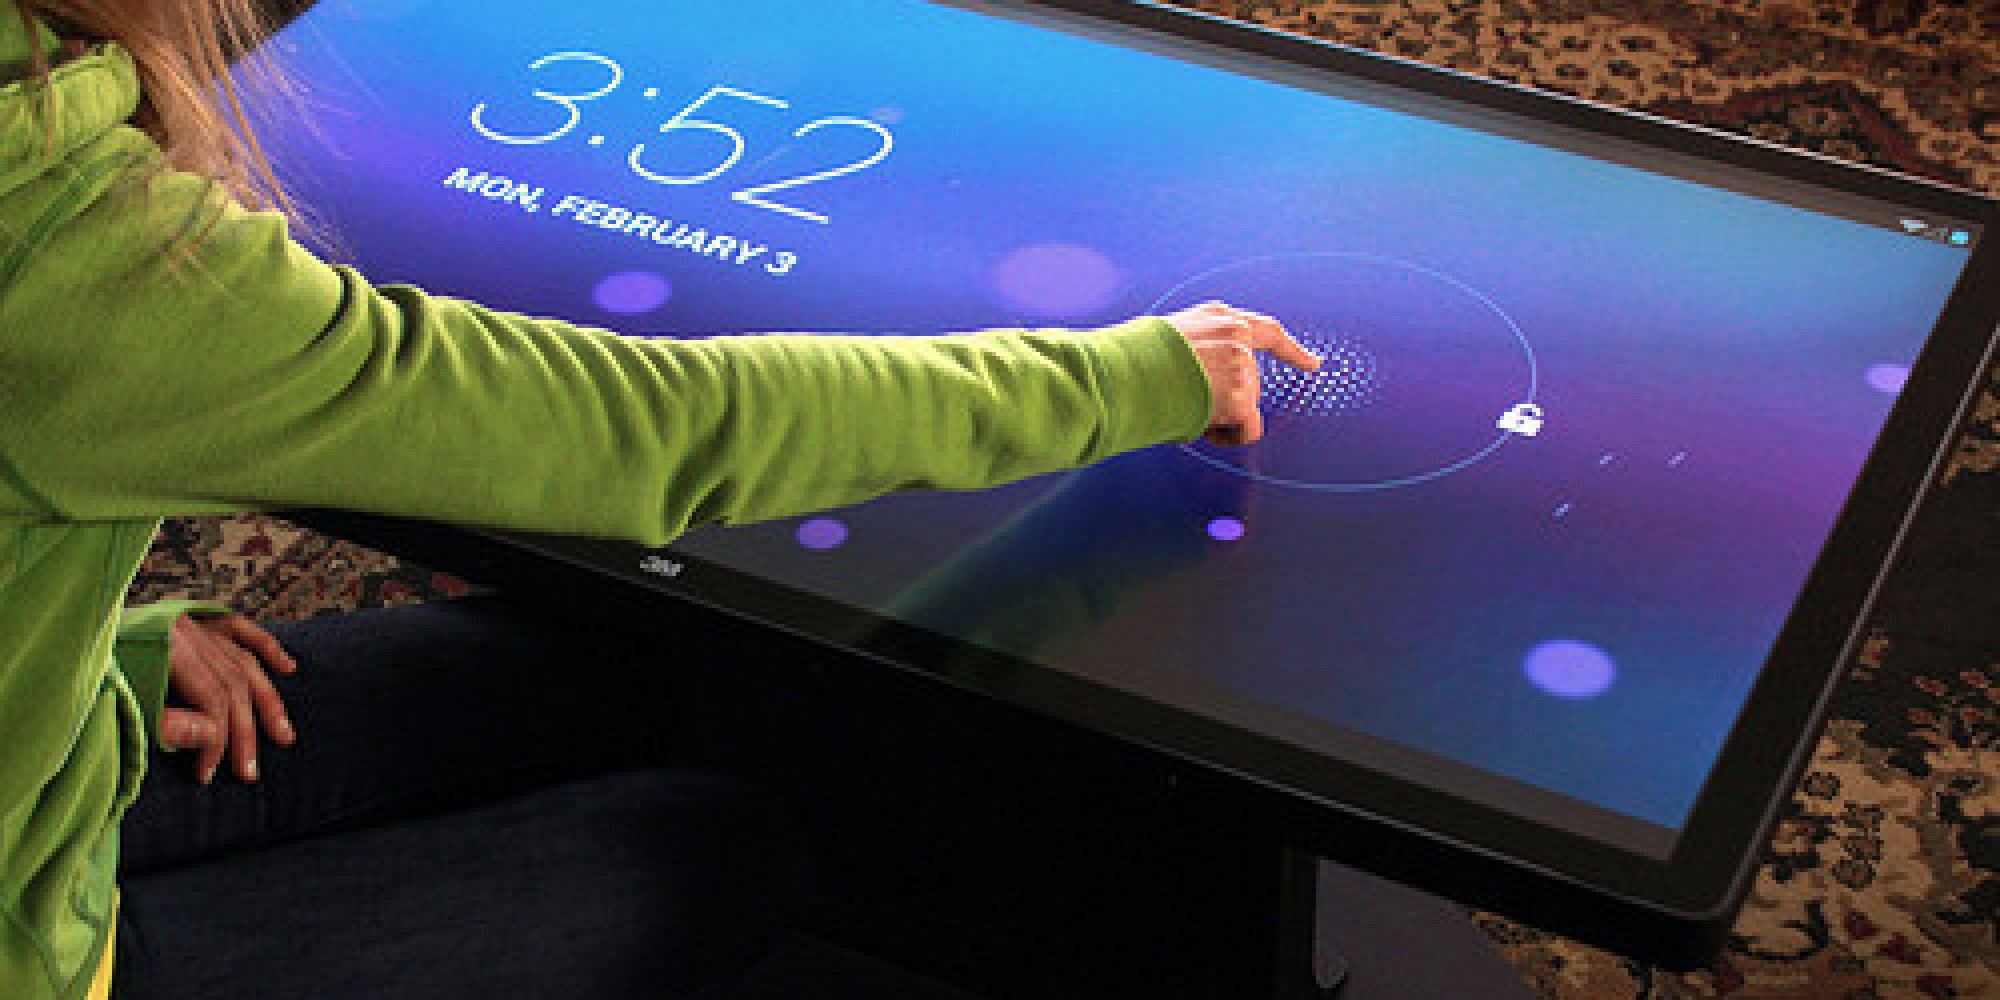 o-TABLE-BASSE-ANDROID-facebook Luxe De Fabriquer Table Basse Tactile Schème